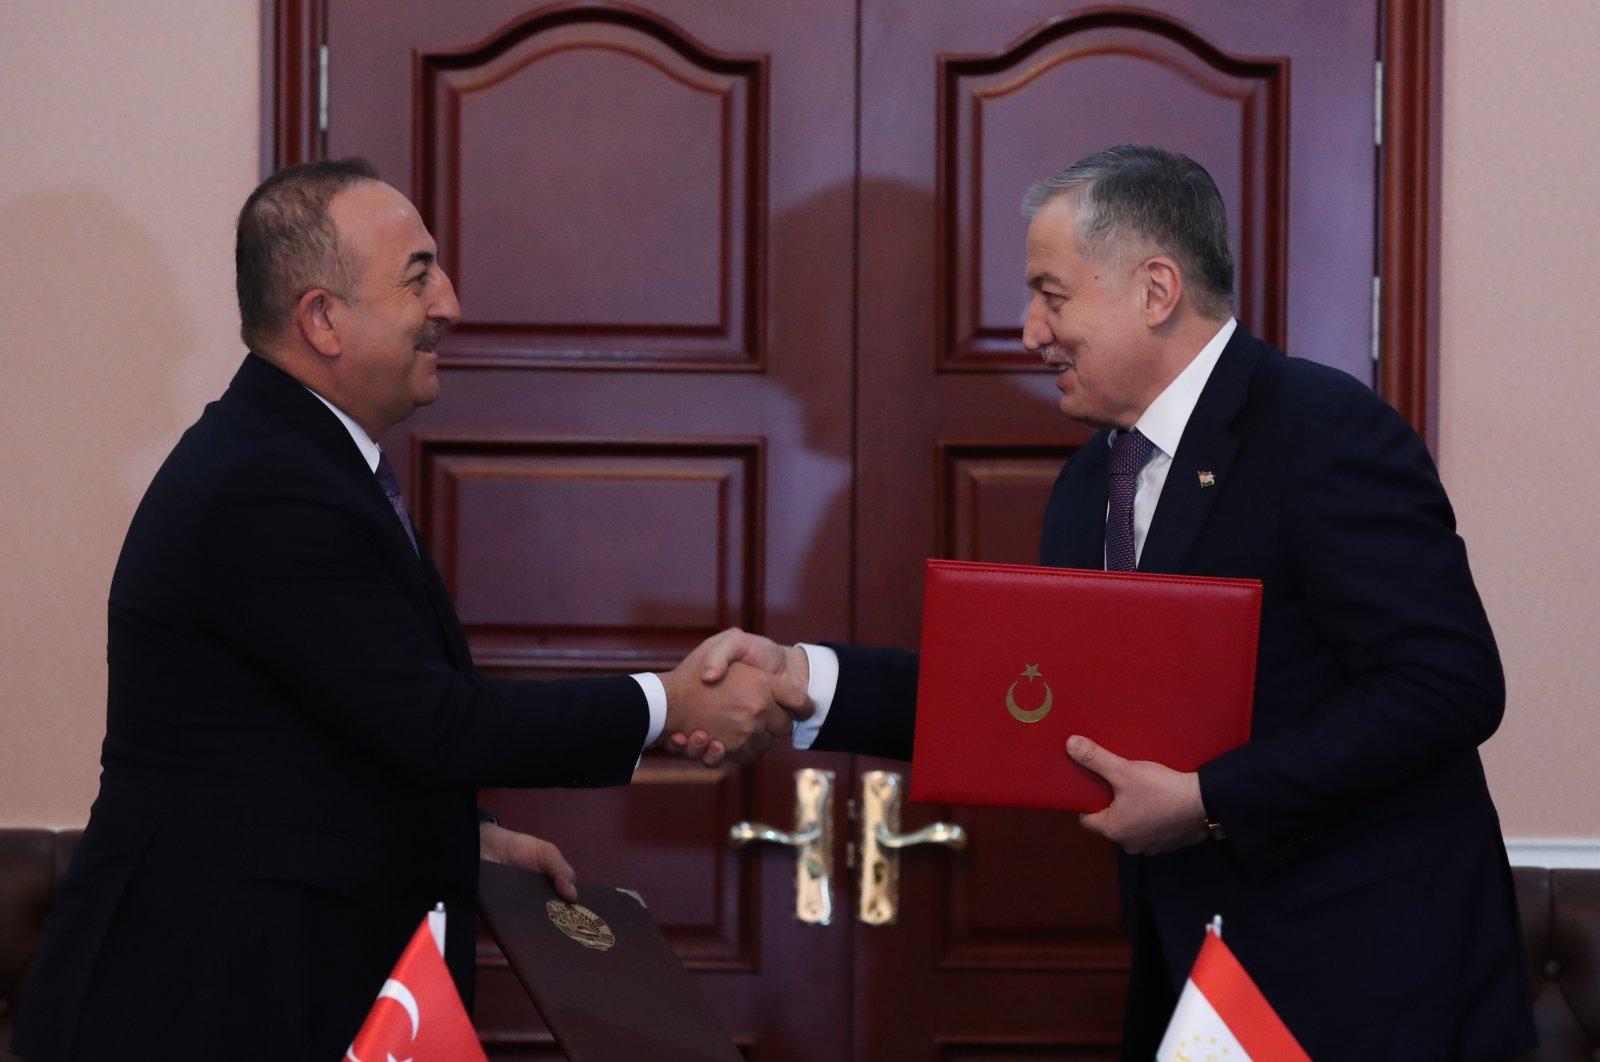 Turkey's Foreign Minister Mevlüt Çavuşoğlu (L) meets with Tajikistan's foreign minister, Sirojiddin Muhriddin, in Dushanbe, the capital of Tajikistan, March 29, 2021. (AA Photos)